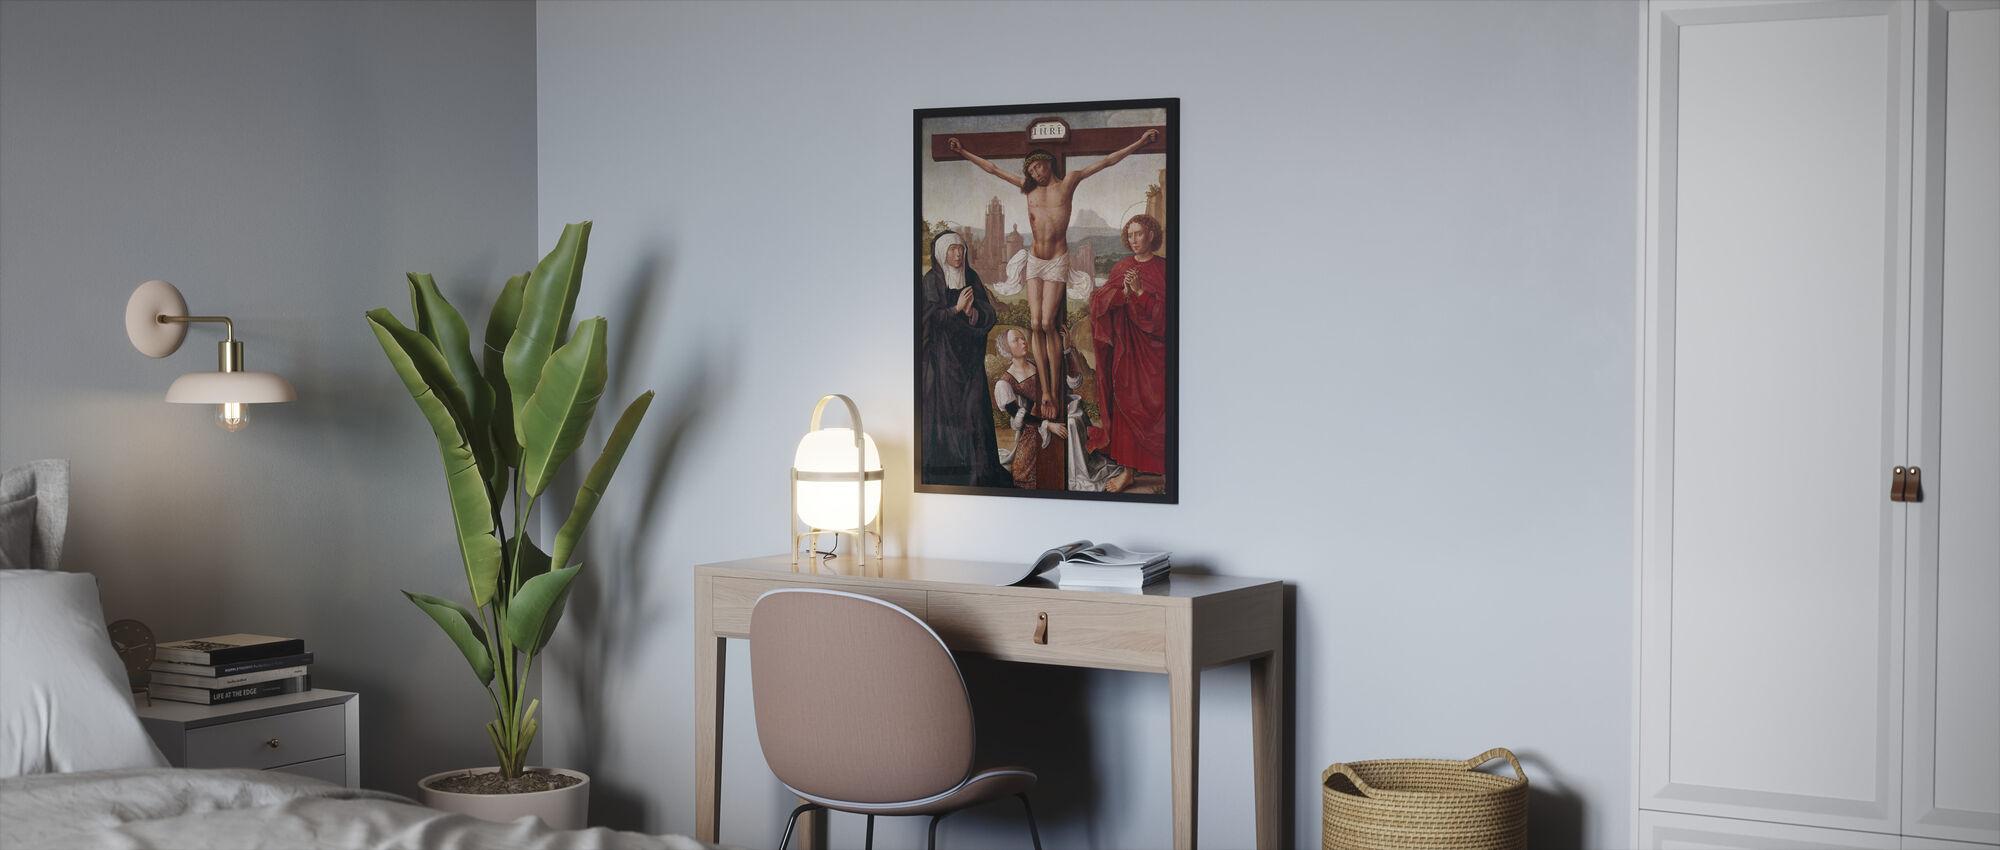 Crucifixión - Print enmarcado - Dormitorio